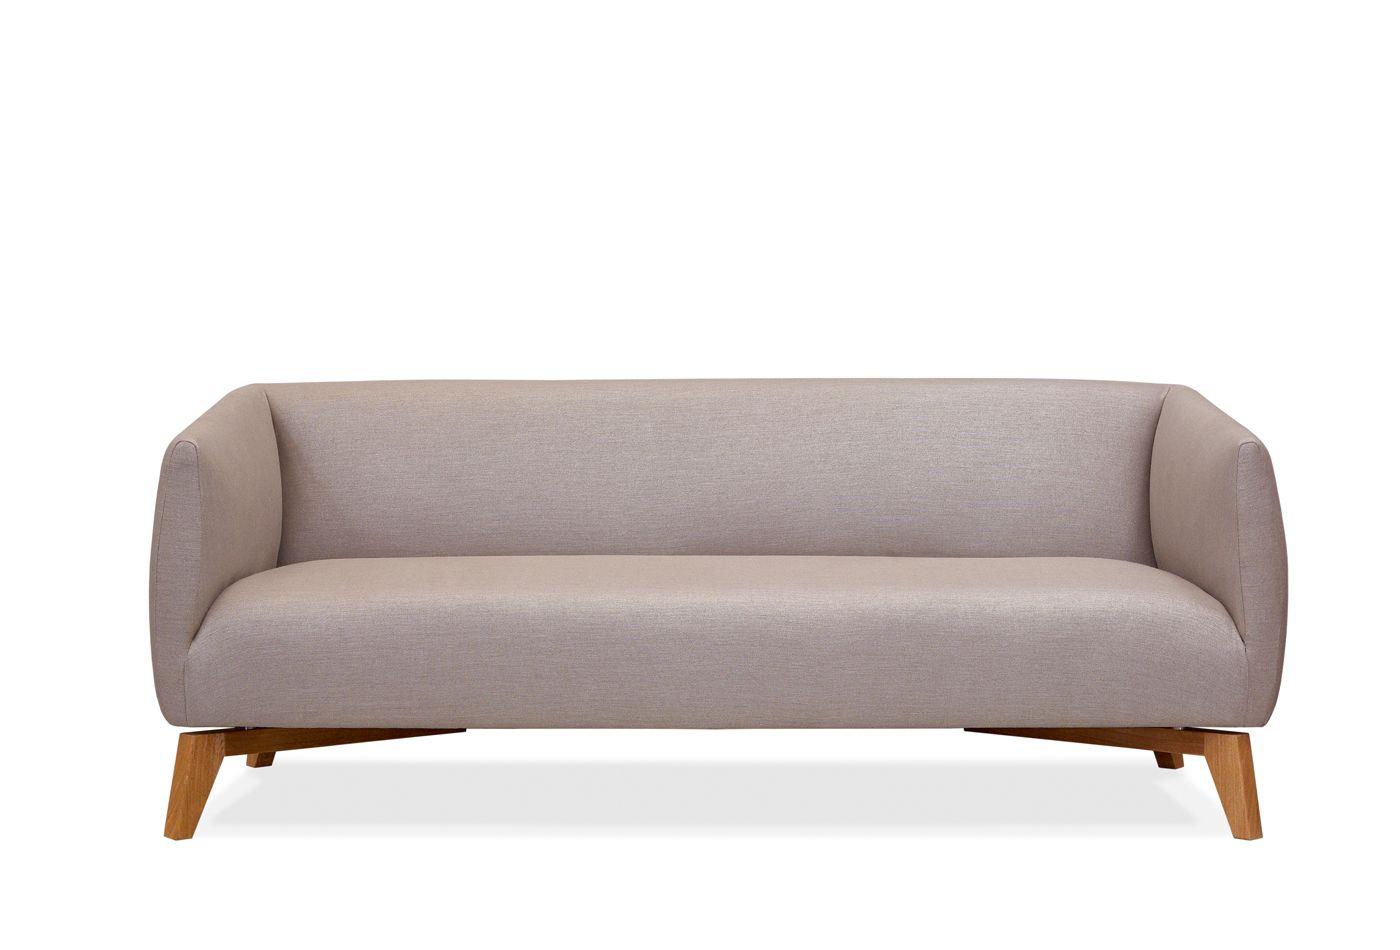 Indie Sofa Zientte Sergio Vergara Sergio Vergara Design  # Muebles Zientte